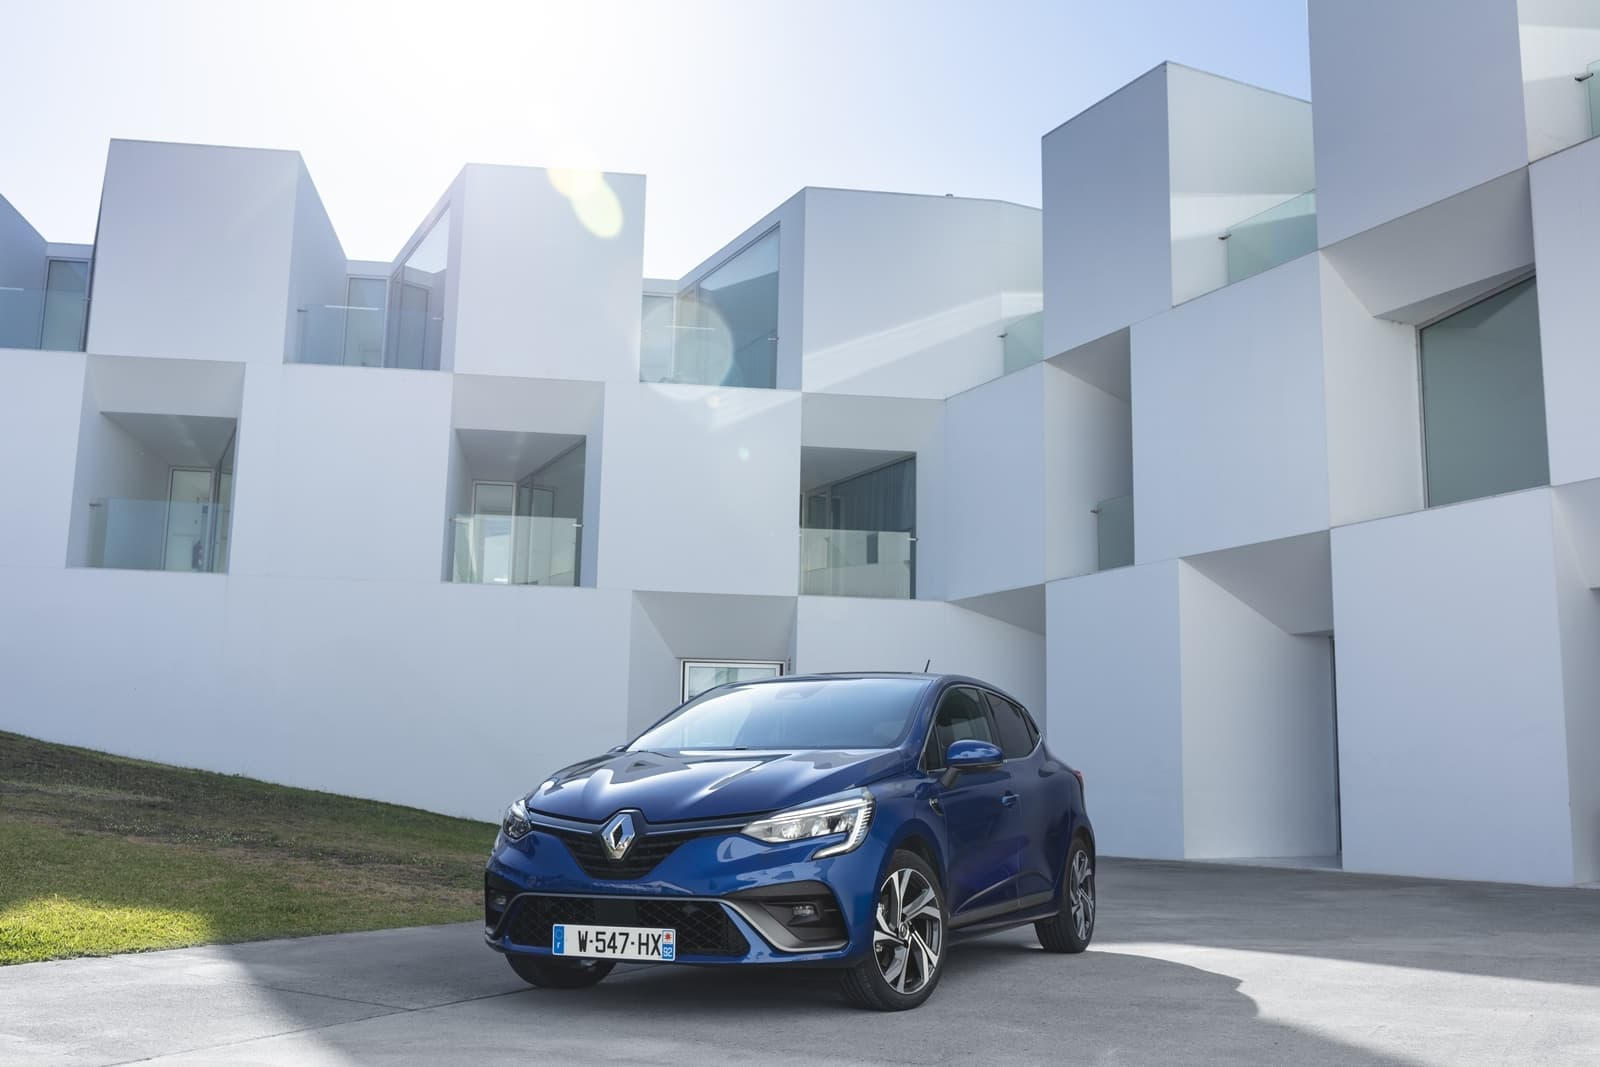 Renault Clio 2020 Prueba 0619 033